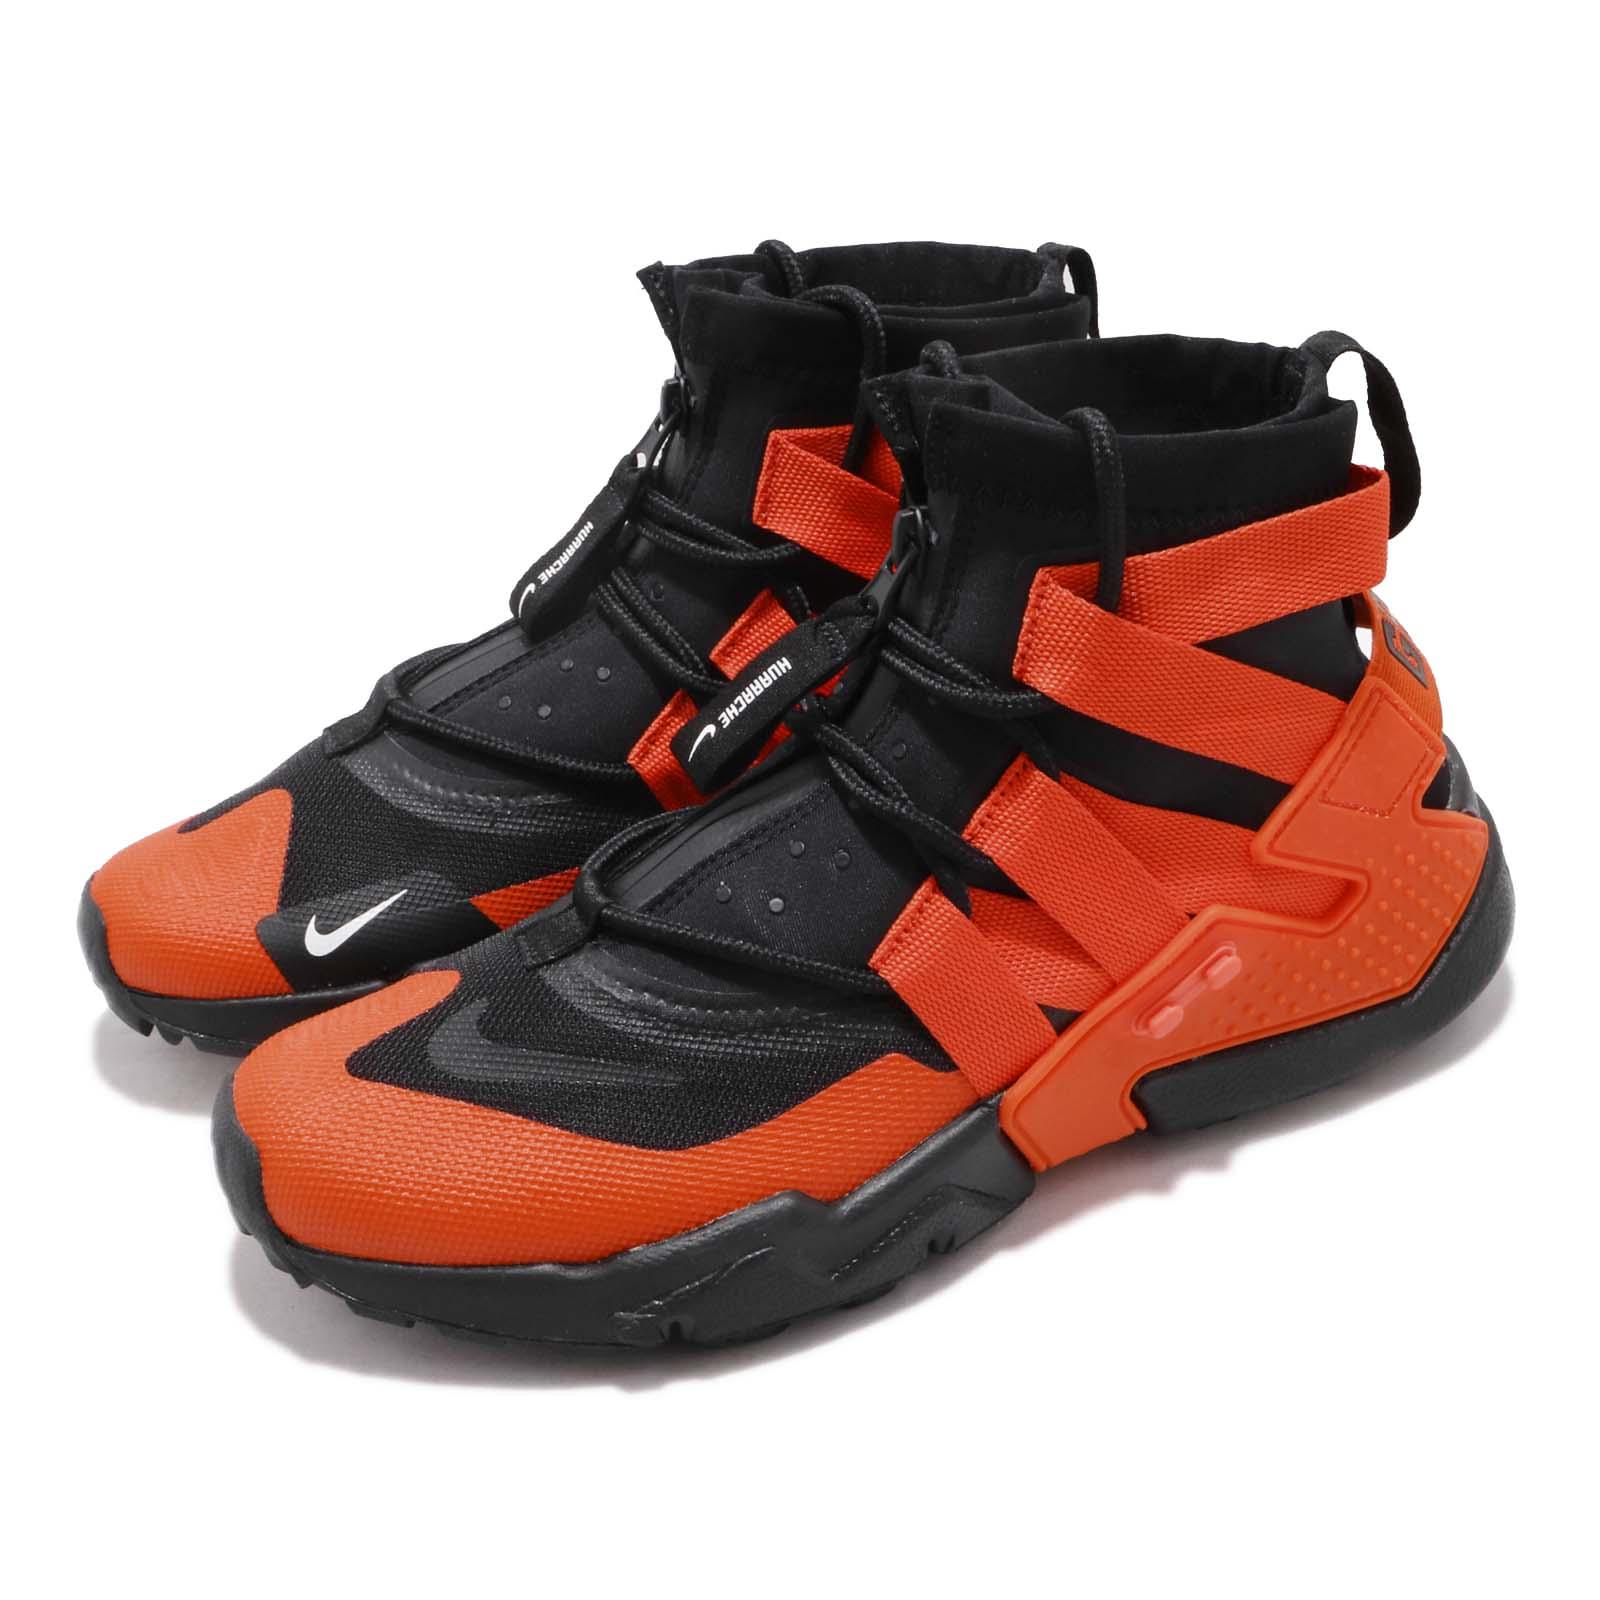 f4478abceb8e Details about Nike Air Huarache Gripp Black Team Orange Men Running Shoes  Sneakers AO1730-001